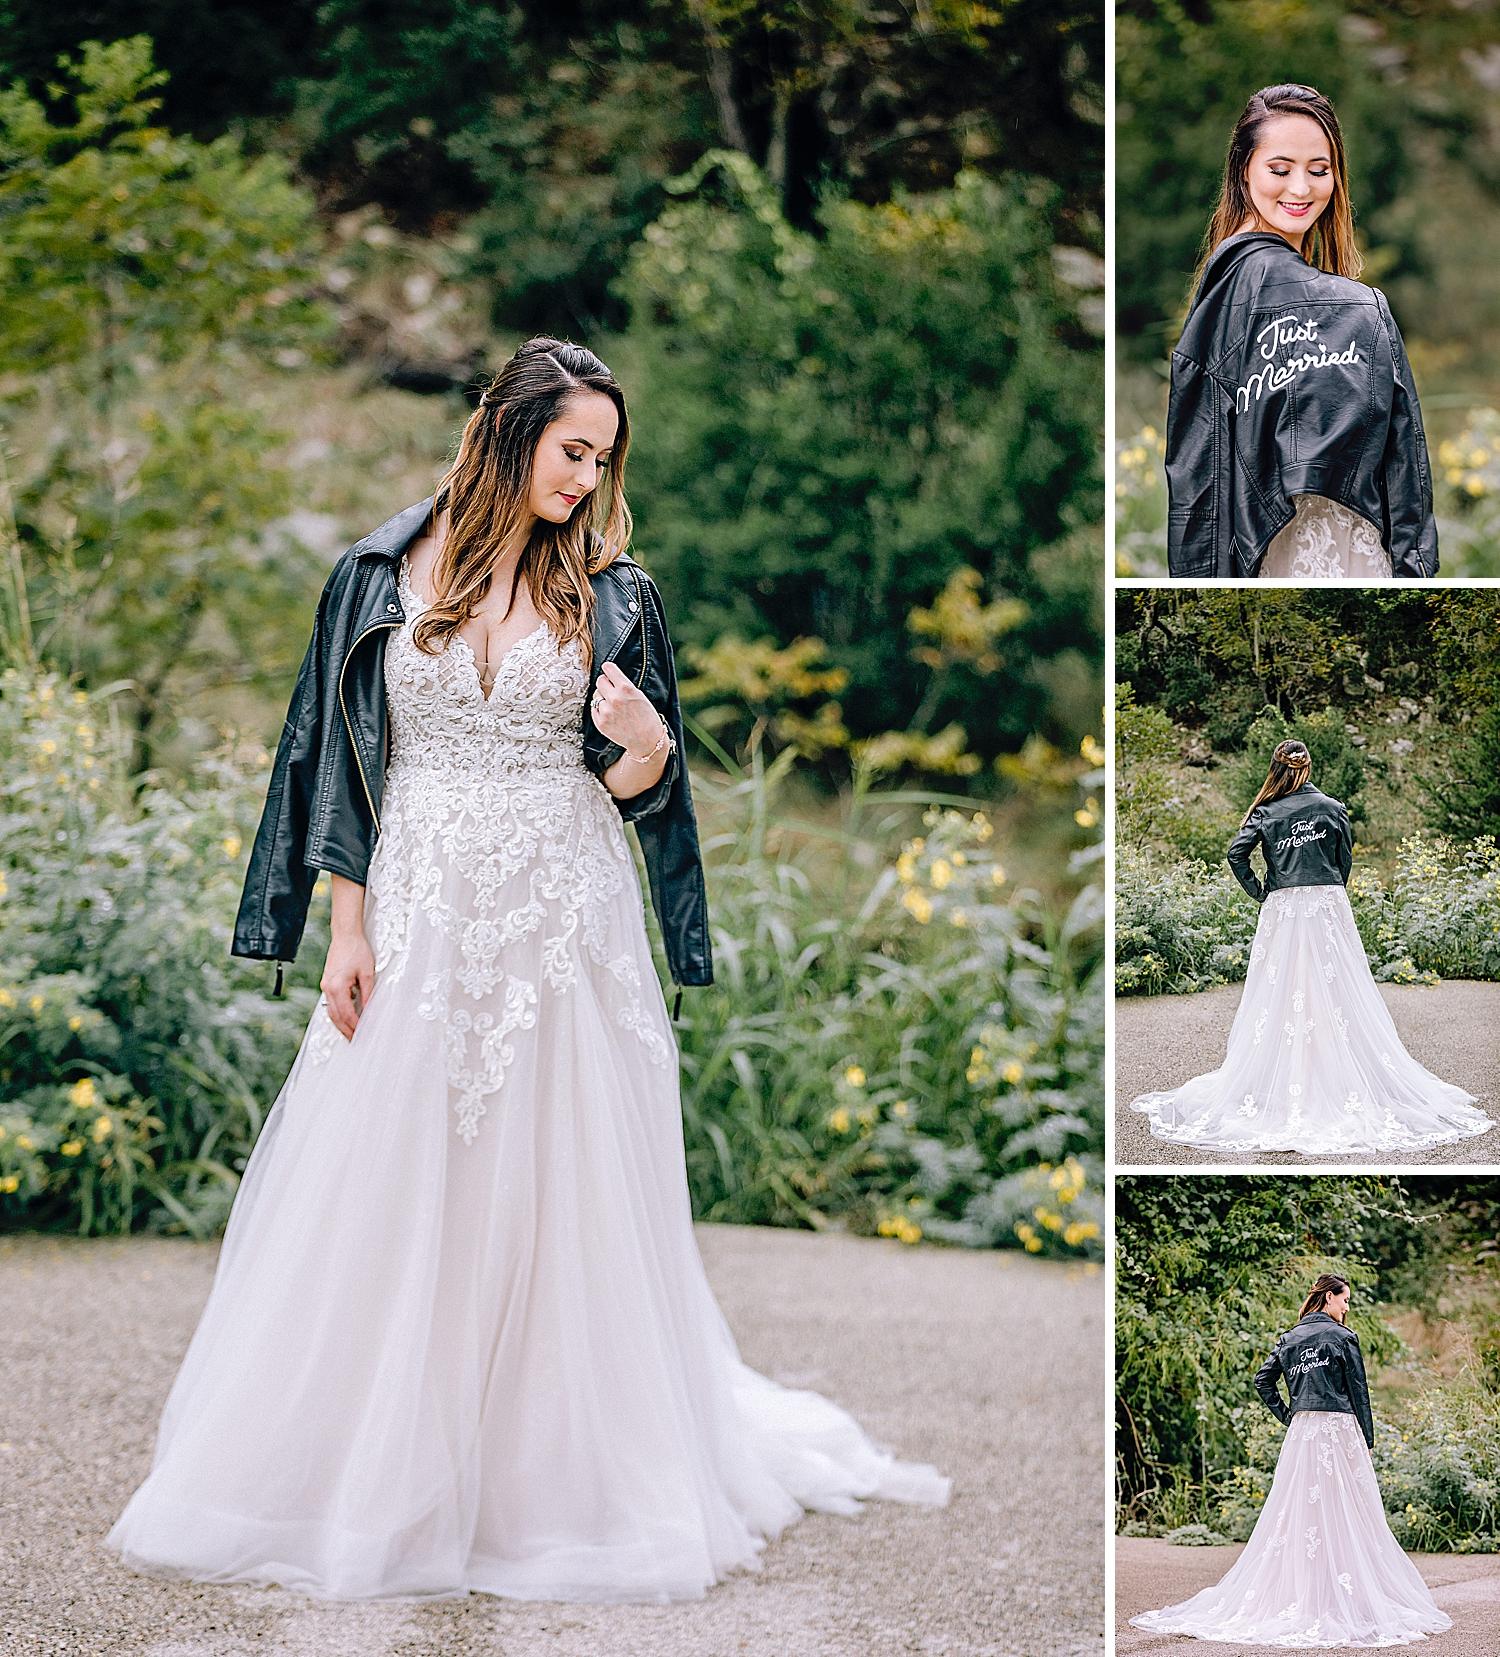 Carly-Barton-Photography-Bridal-Photos-Remis-Ridge-Hidden-Falls-New-Braunfels-Texas-Bride_0010.jpg